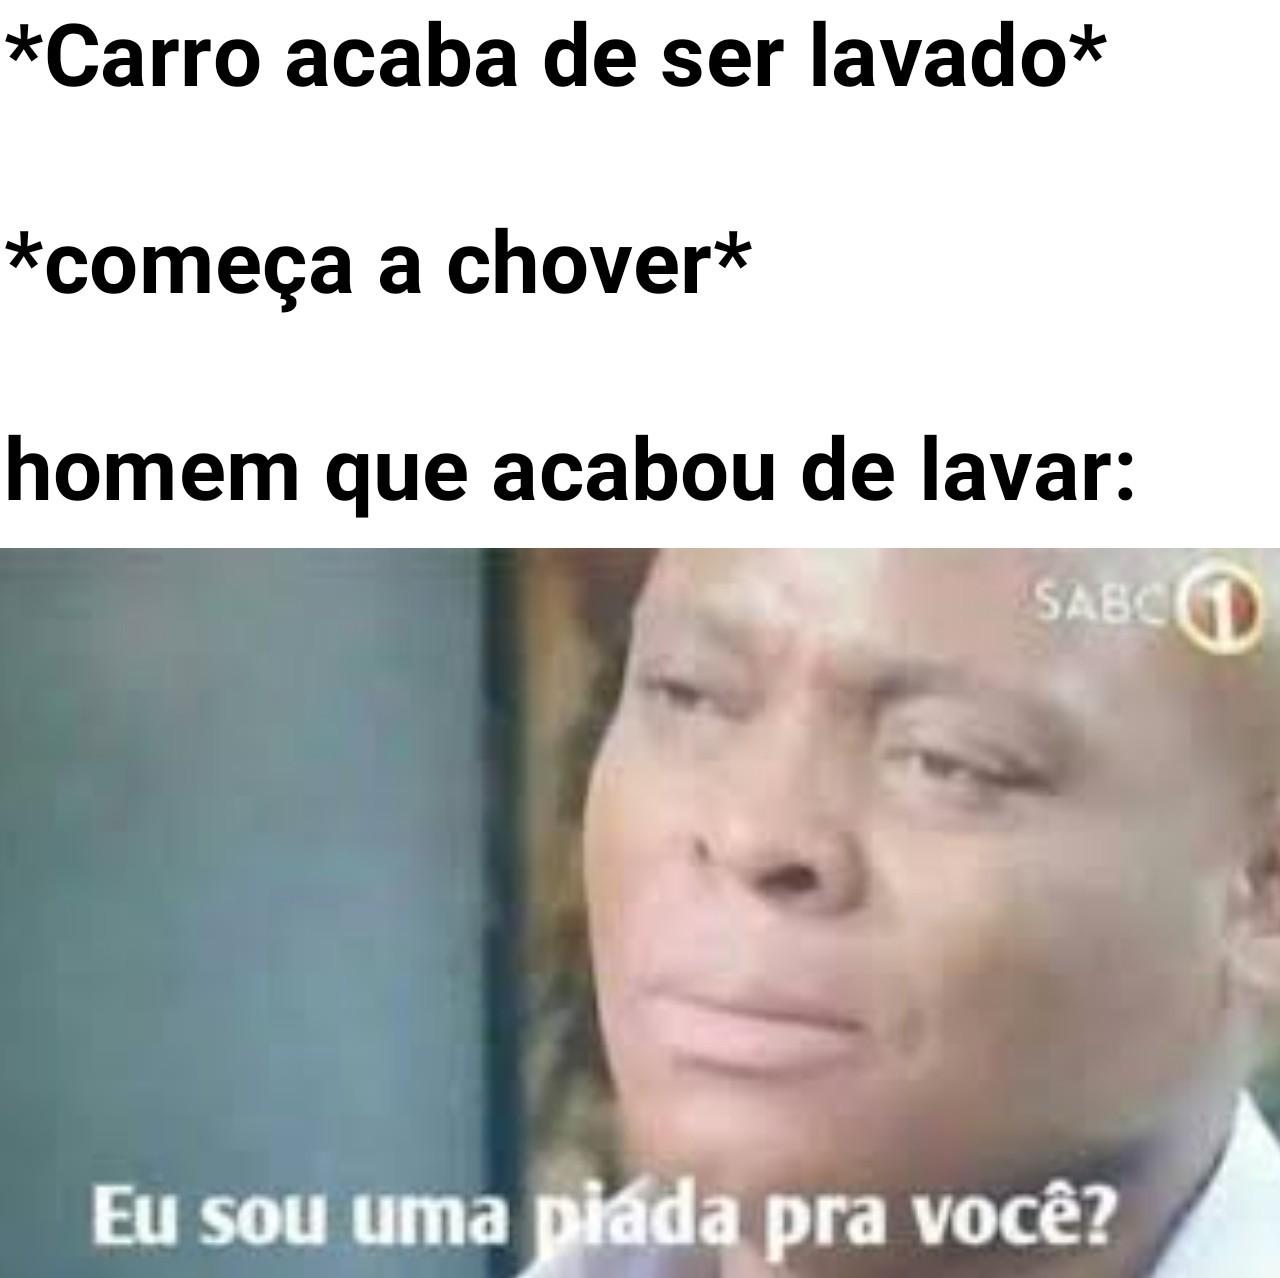 CARROS - meme